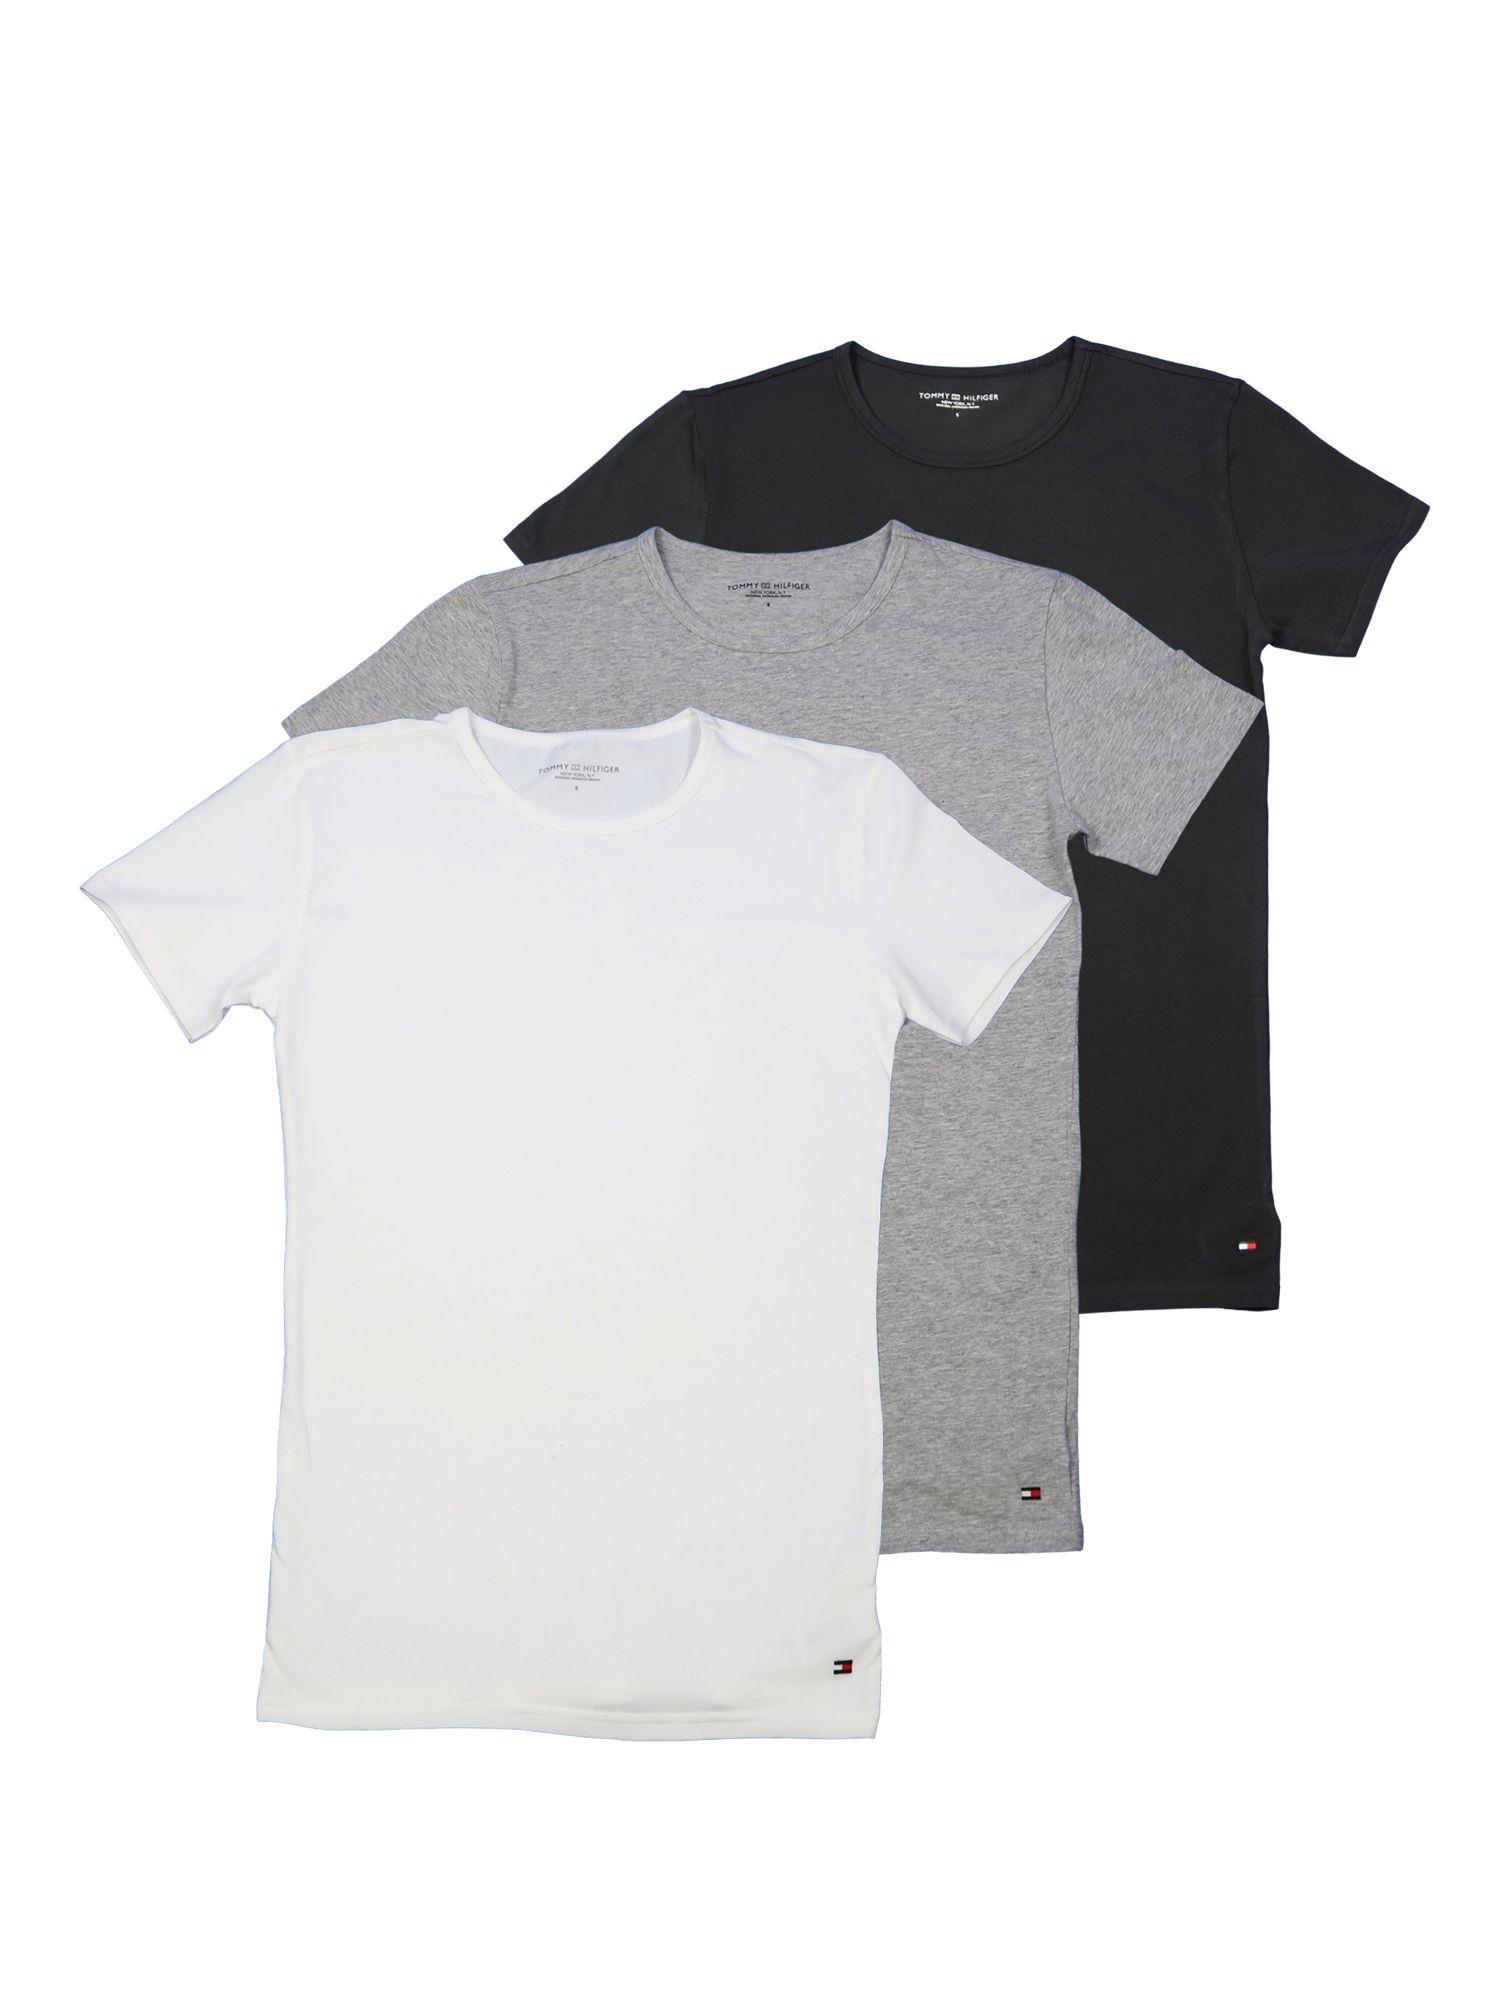 Tommy Hilfiger Herren T-Shirt Kurzarm CN Tee 3er Pack Premium XXL